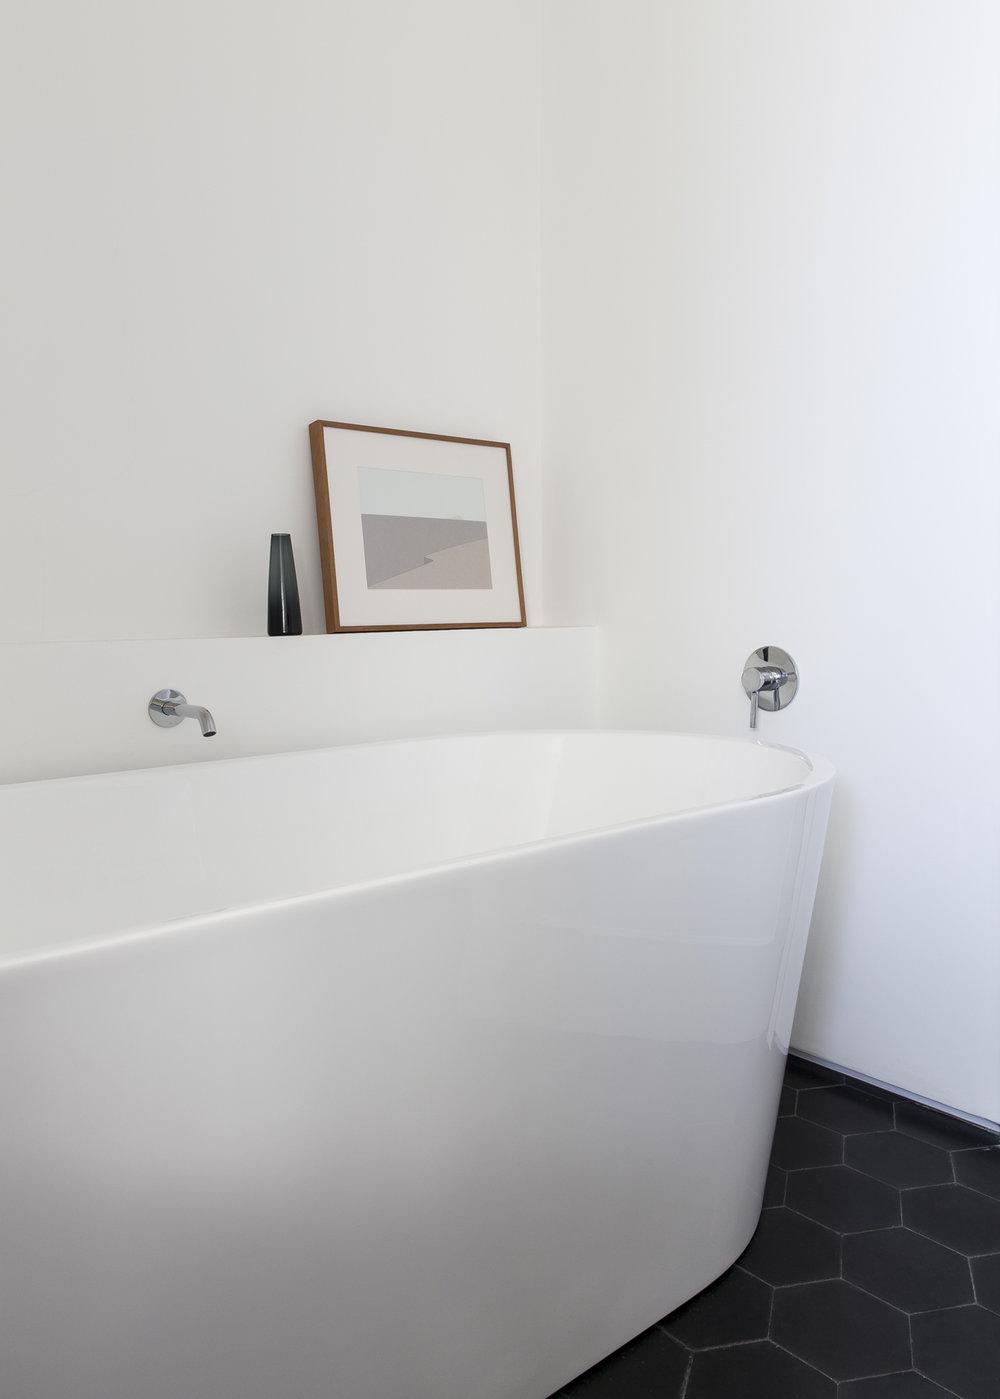 banhos rb - estudio nodo-6.jpg